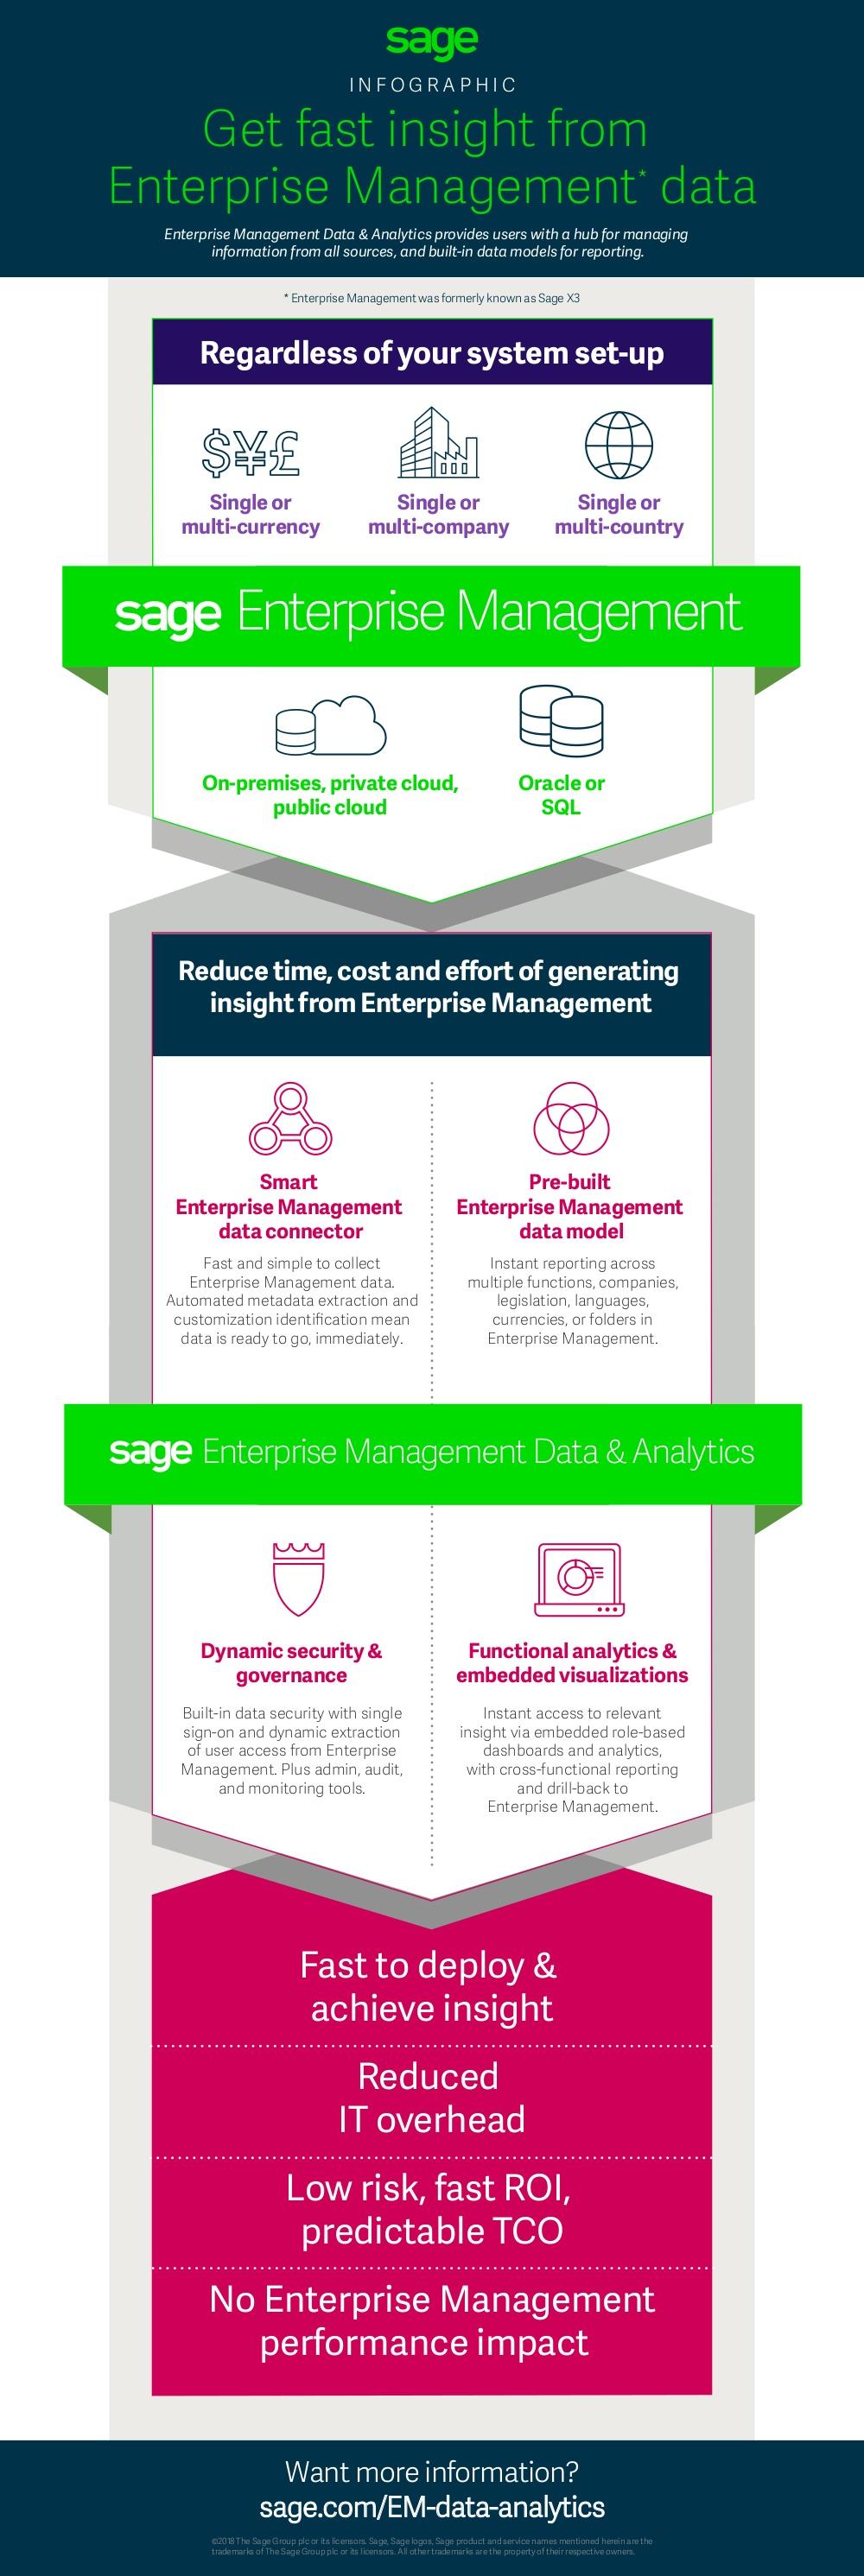 Sage EM Data Analytics insight infographic.